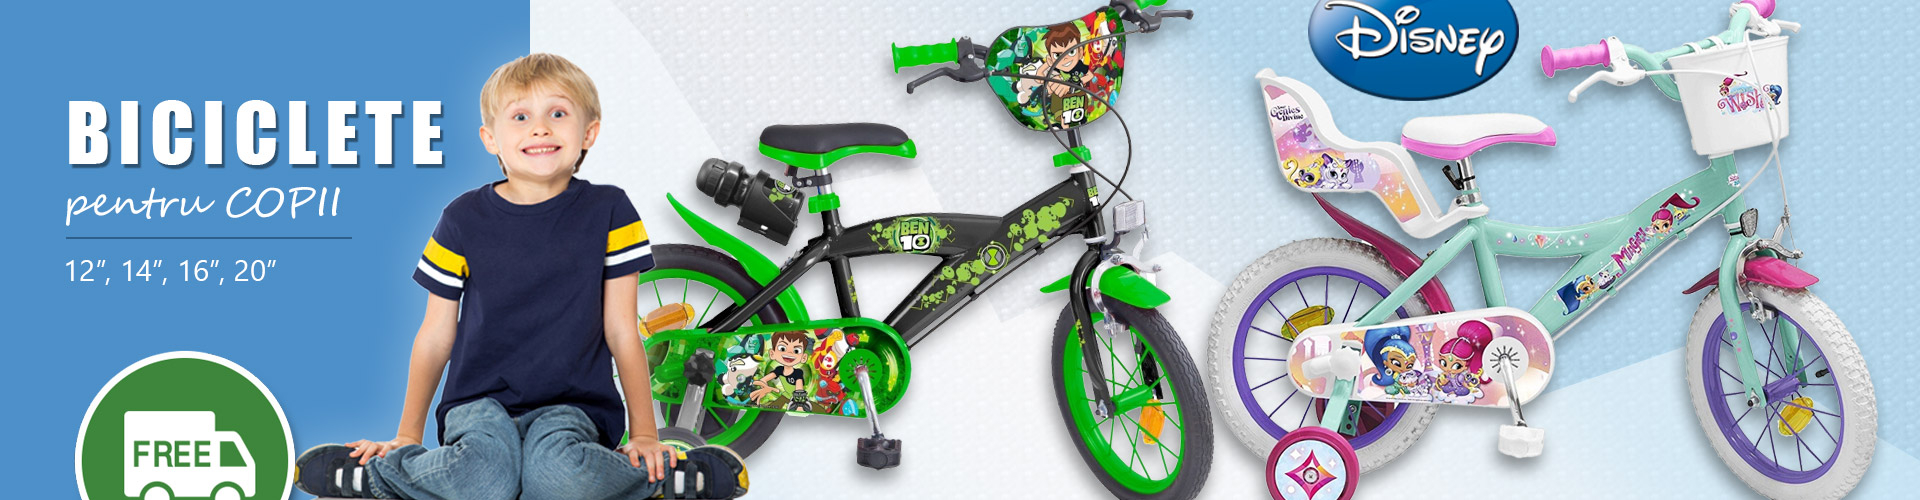 Biciclete Disney Frozen, Disney Cars, Soy Luna, Ben 10